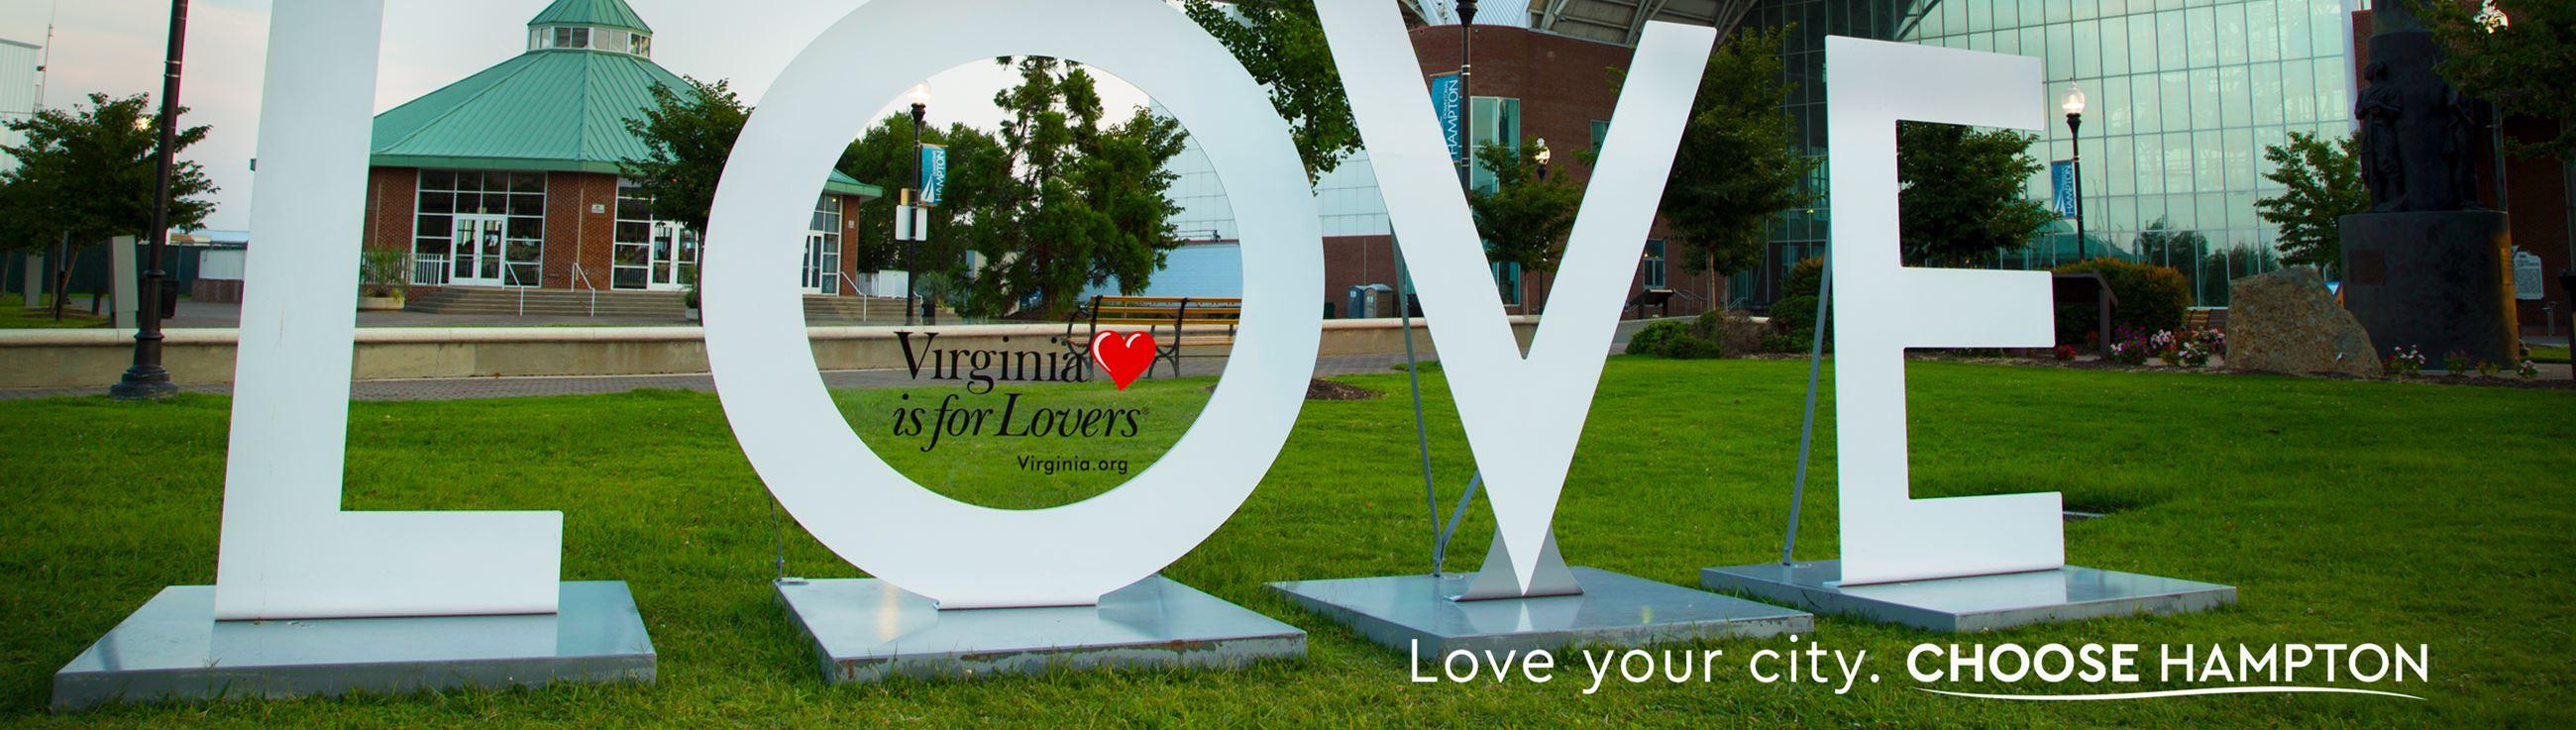 Hampton Va Official Website Emg Pickup Wiring Diagram 2 Volumes 1 Tone Love Opens In New Window